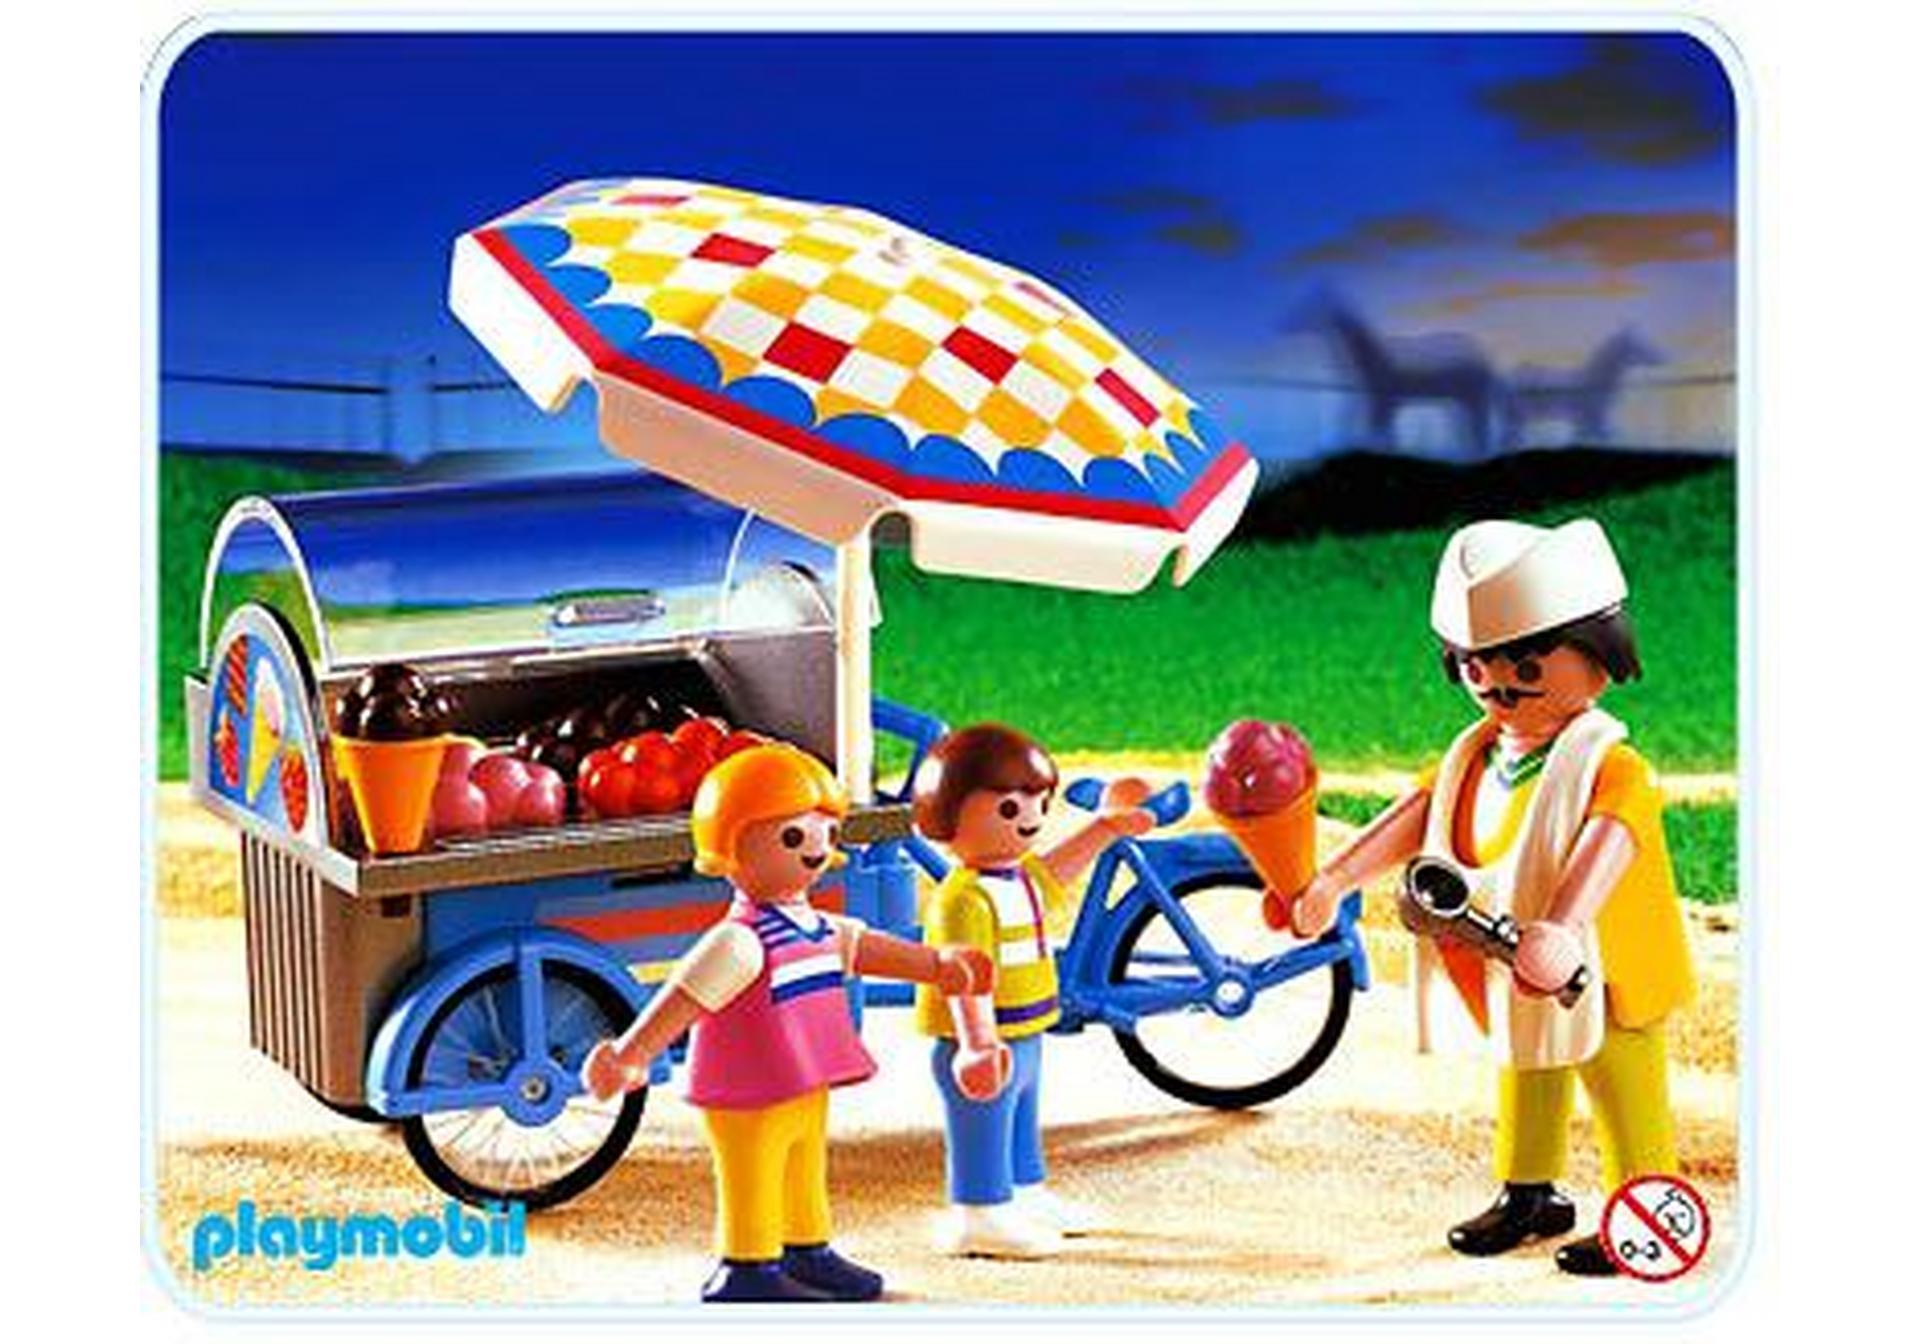 Eisverk ufer 3244 b playmobil deutschland for Jugendzimmer playmobil